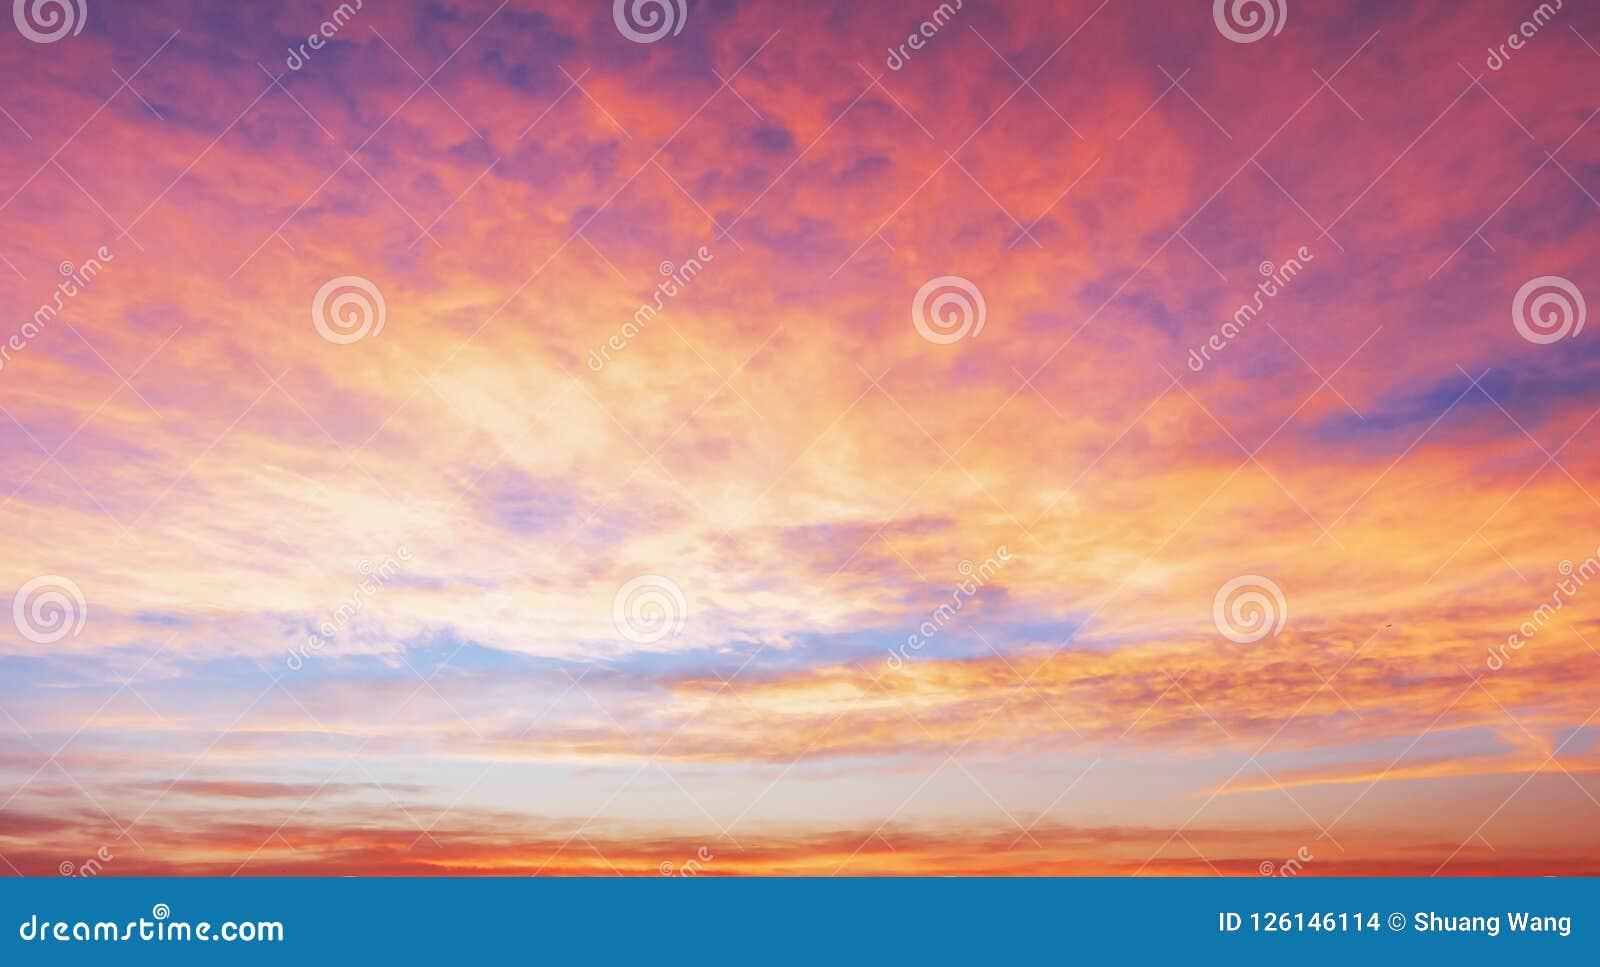 Season Concept: Sky Autumn Sunrise Background Stock Photo - Image of ...